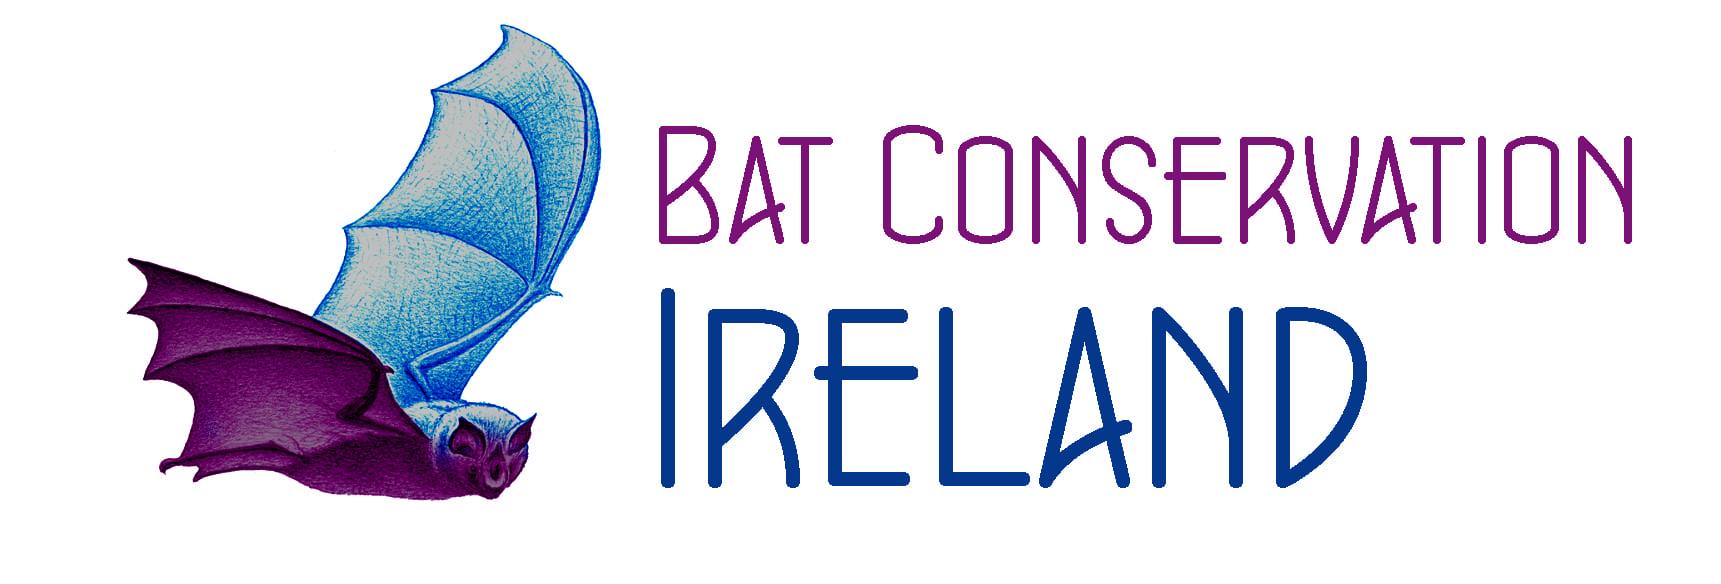 Bat Conservation Ireland logo